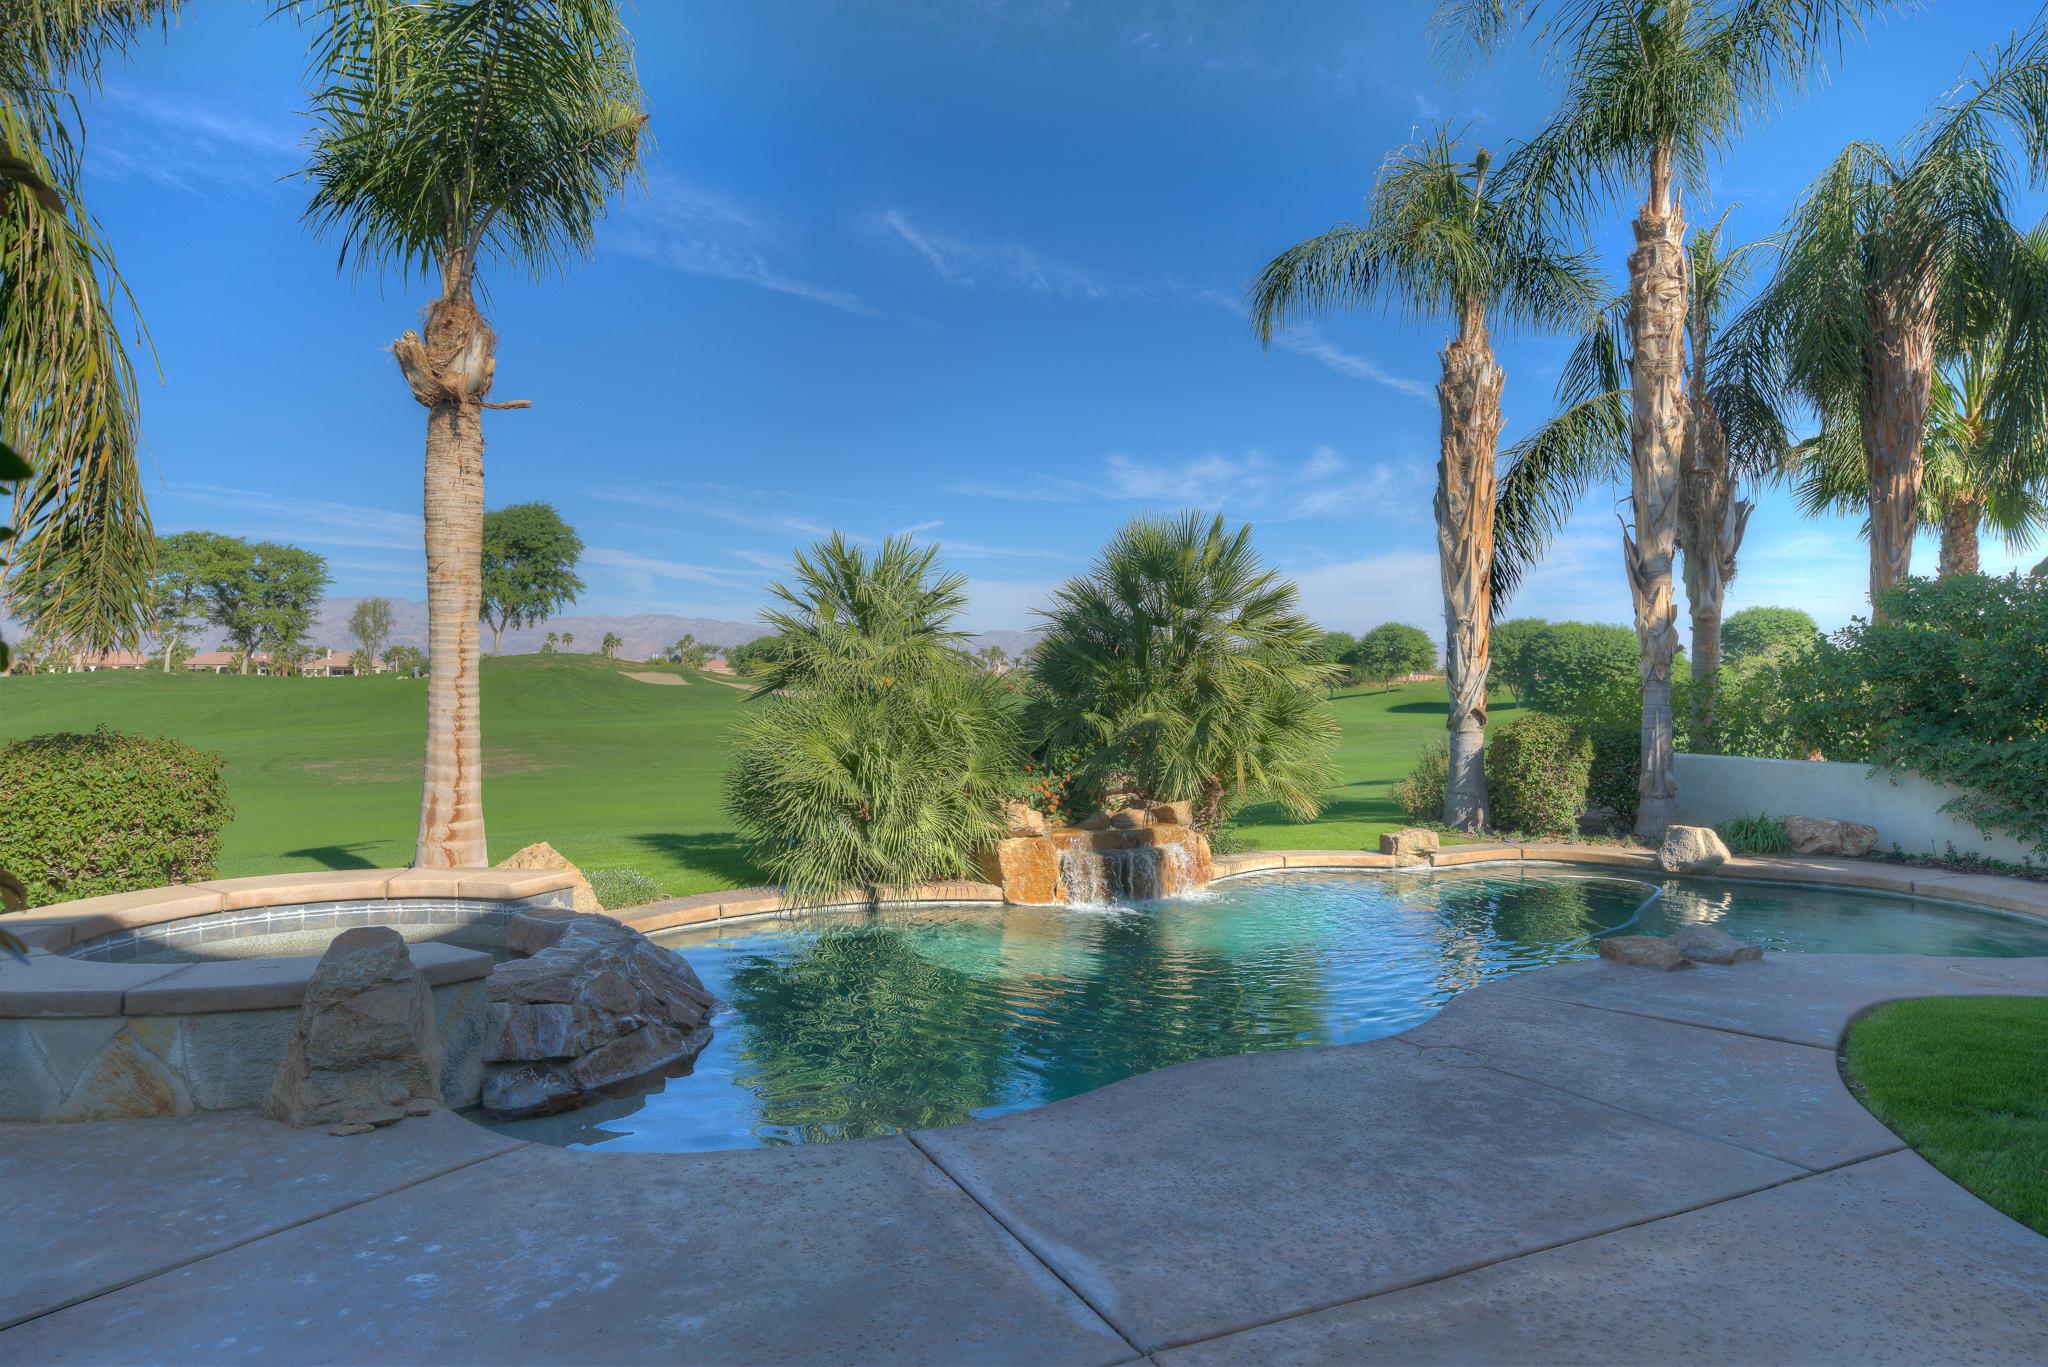 80350 Torreon Way, La Quinta, California 92253, 3 Bedrooms Bedrooms, ,4 BathroomsBathrooms,Residential,For Sale,80350 Torreon Way,219042670